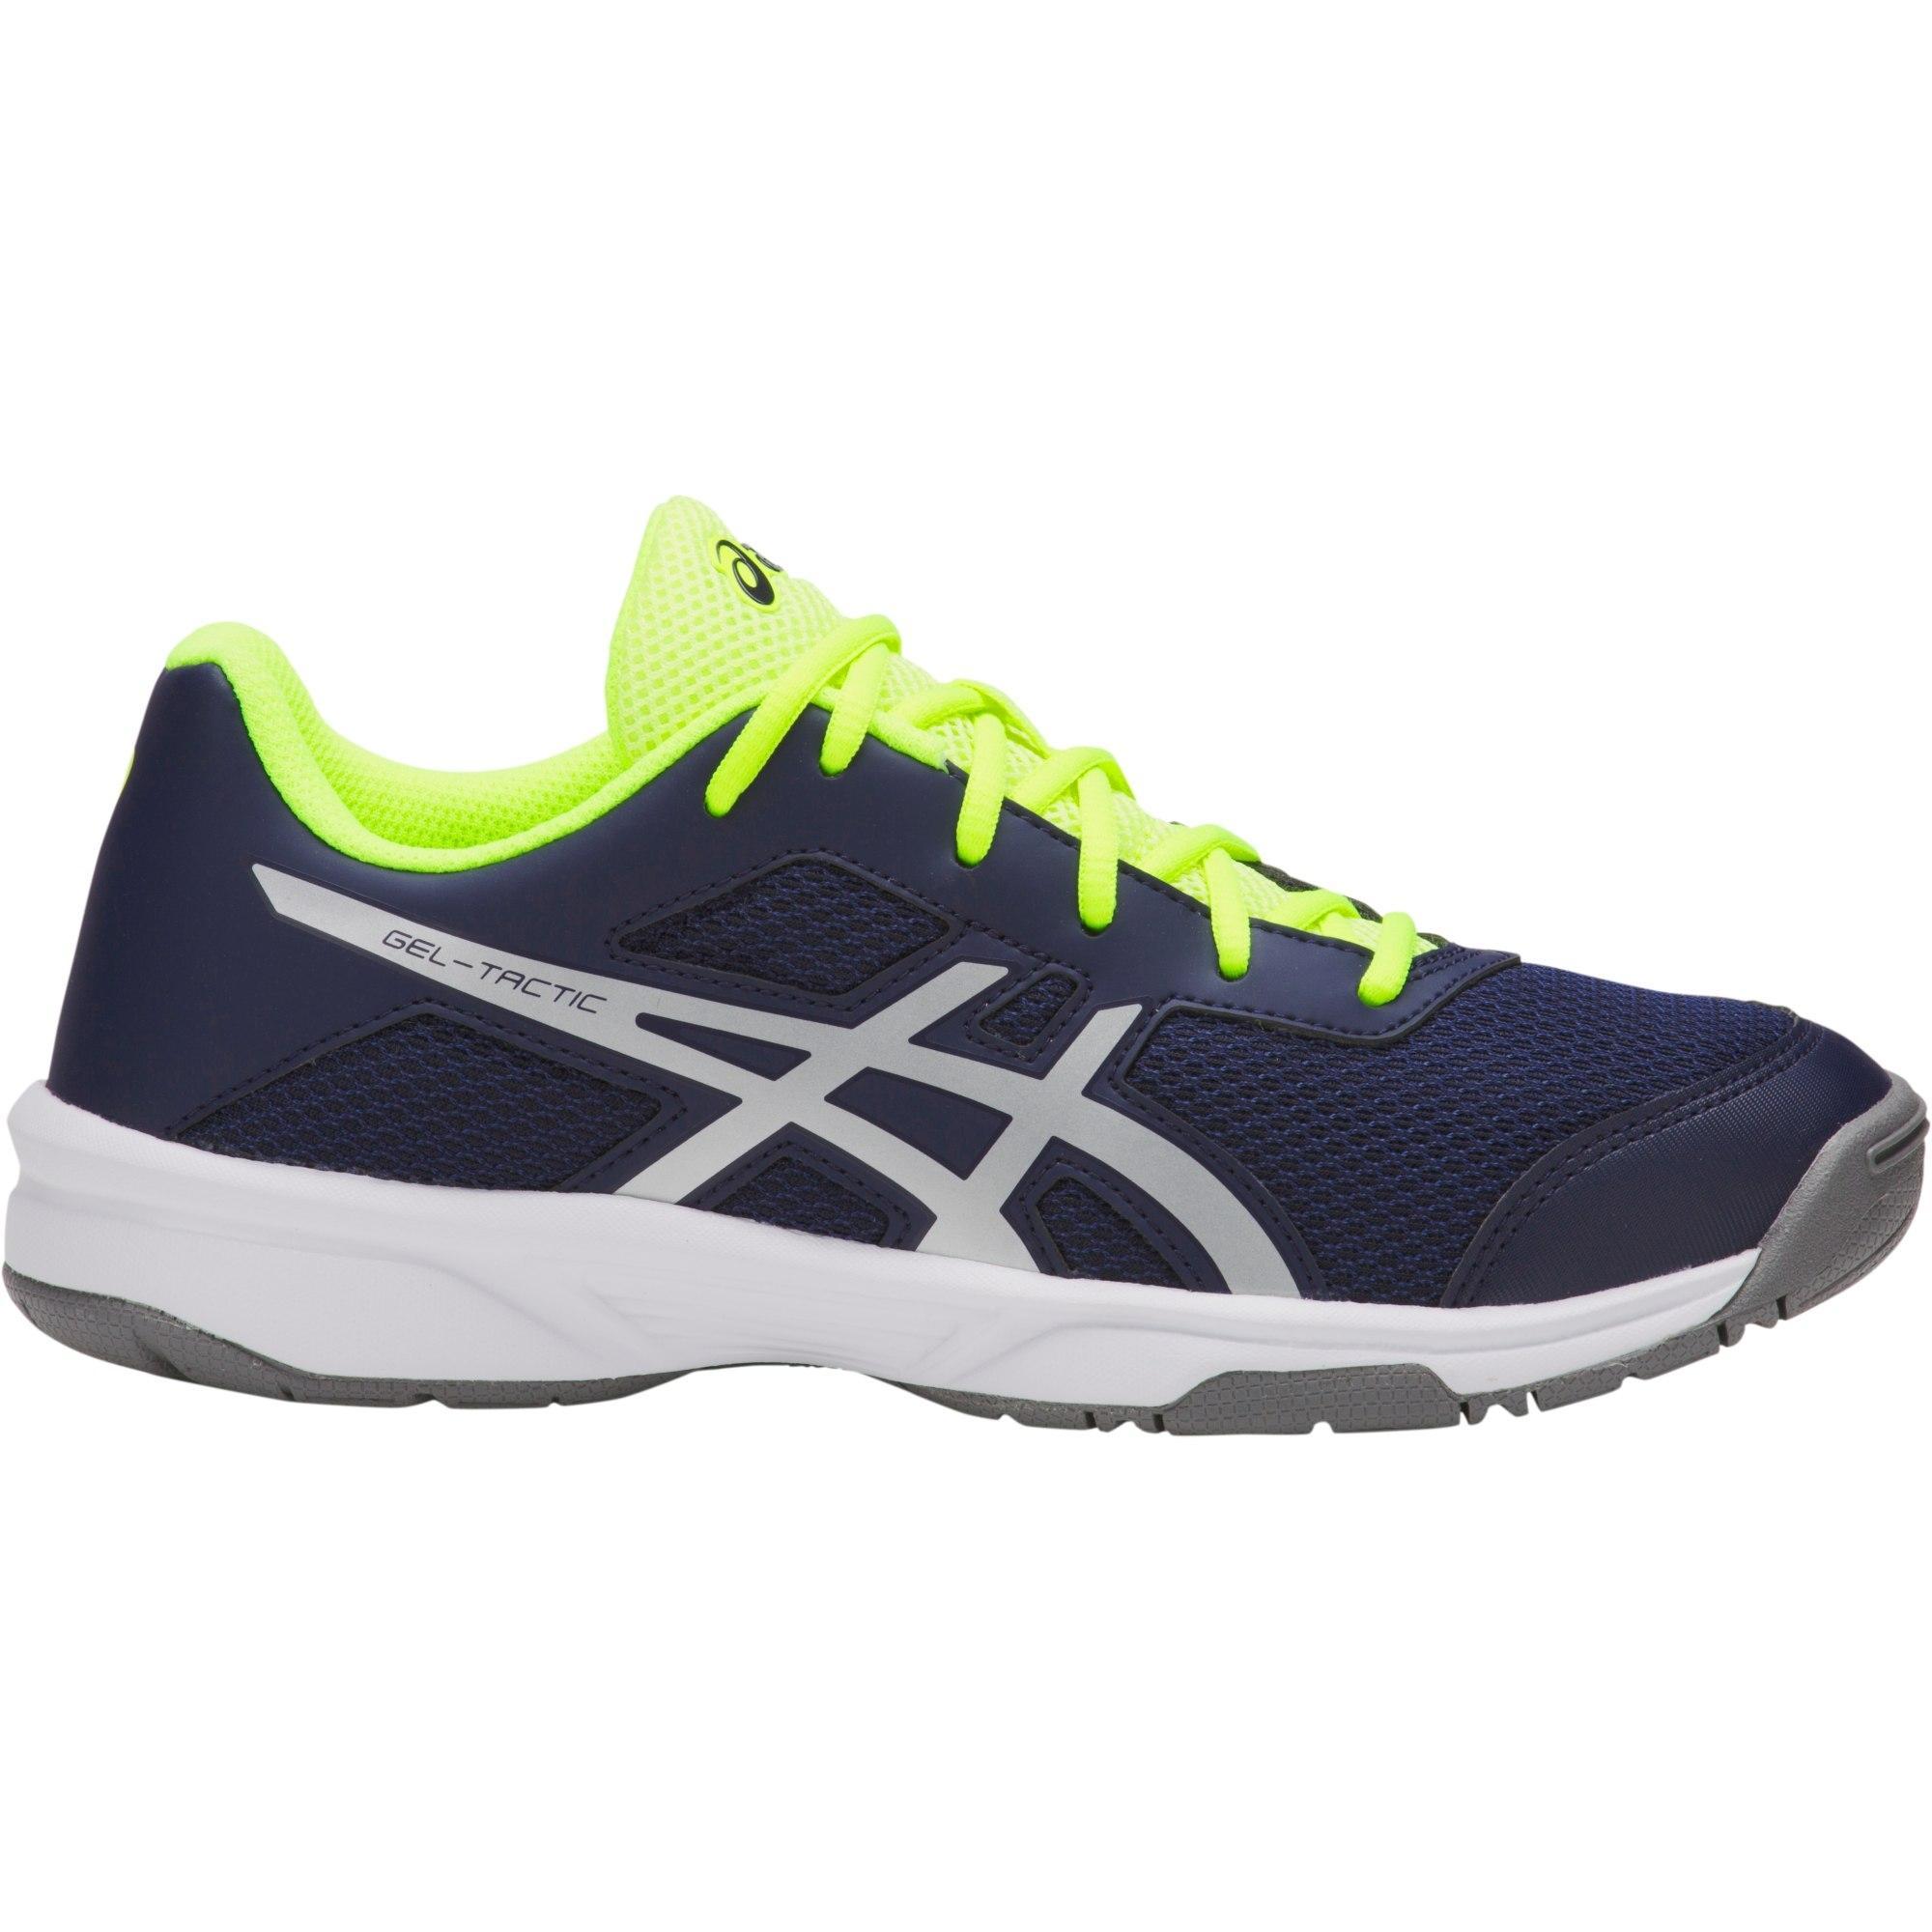 76262509c Asics Kids GEL-Tactic Indoor Court Shoes - Peacoat/Silver - Tennisnuts.com